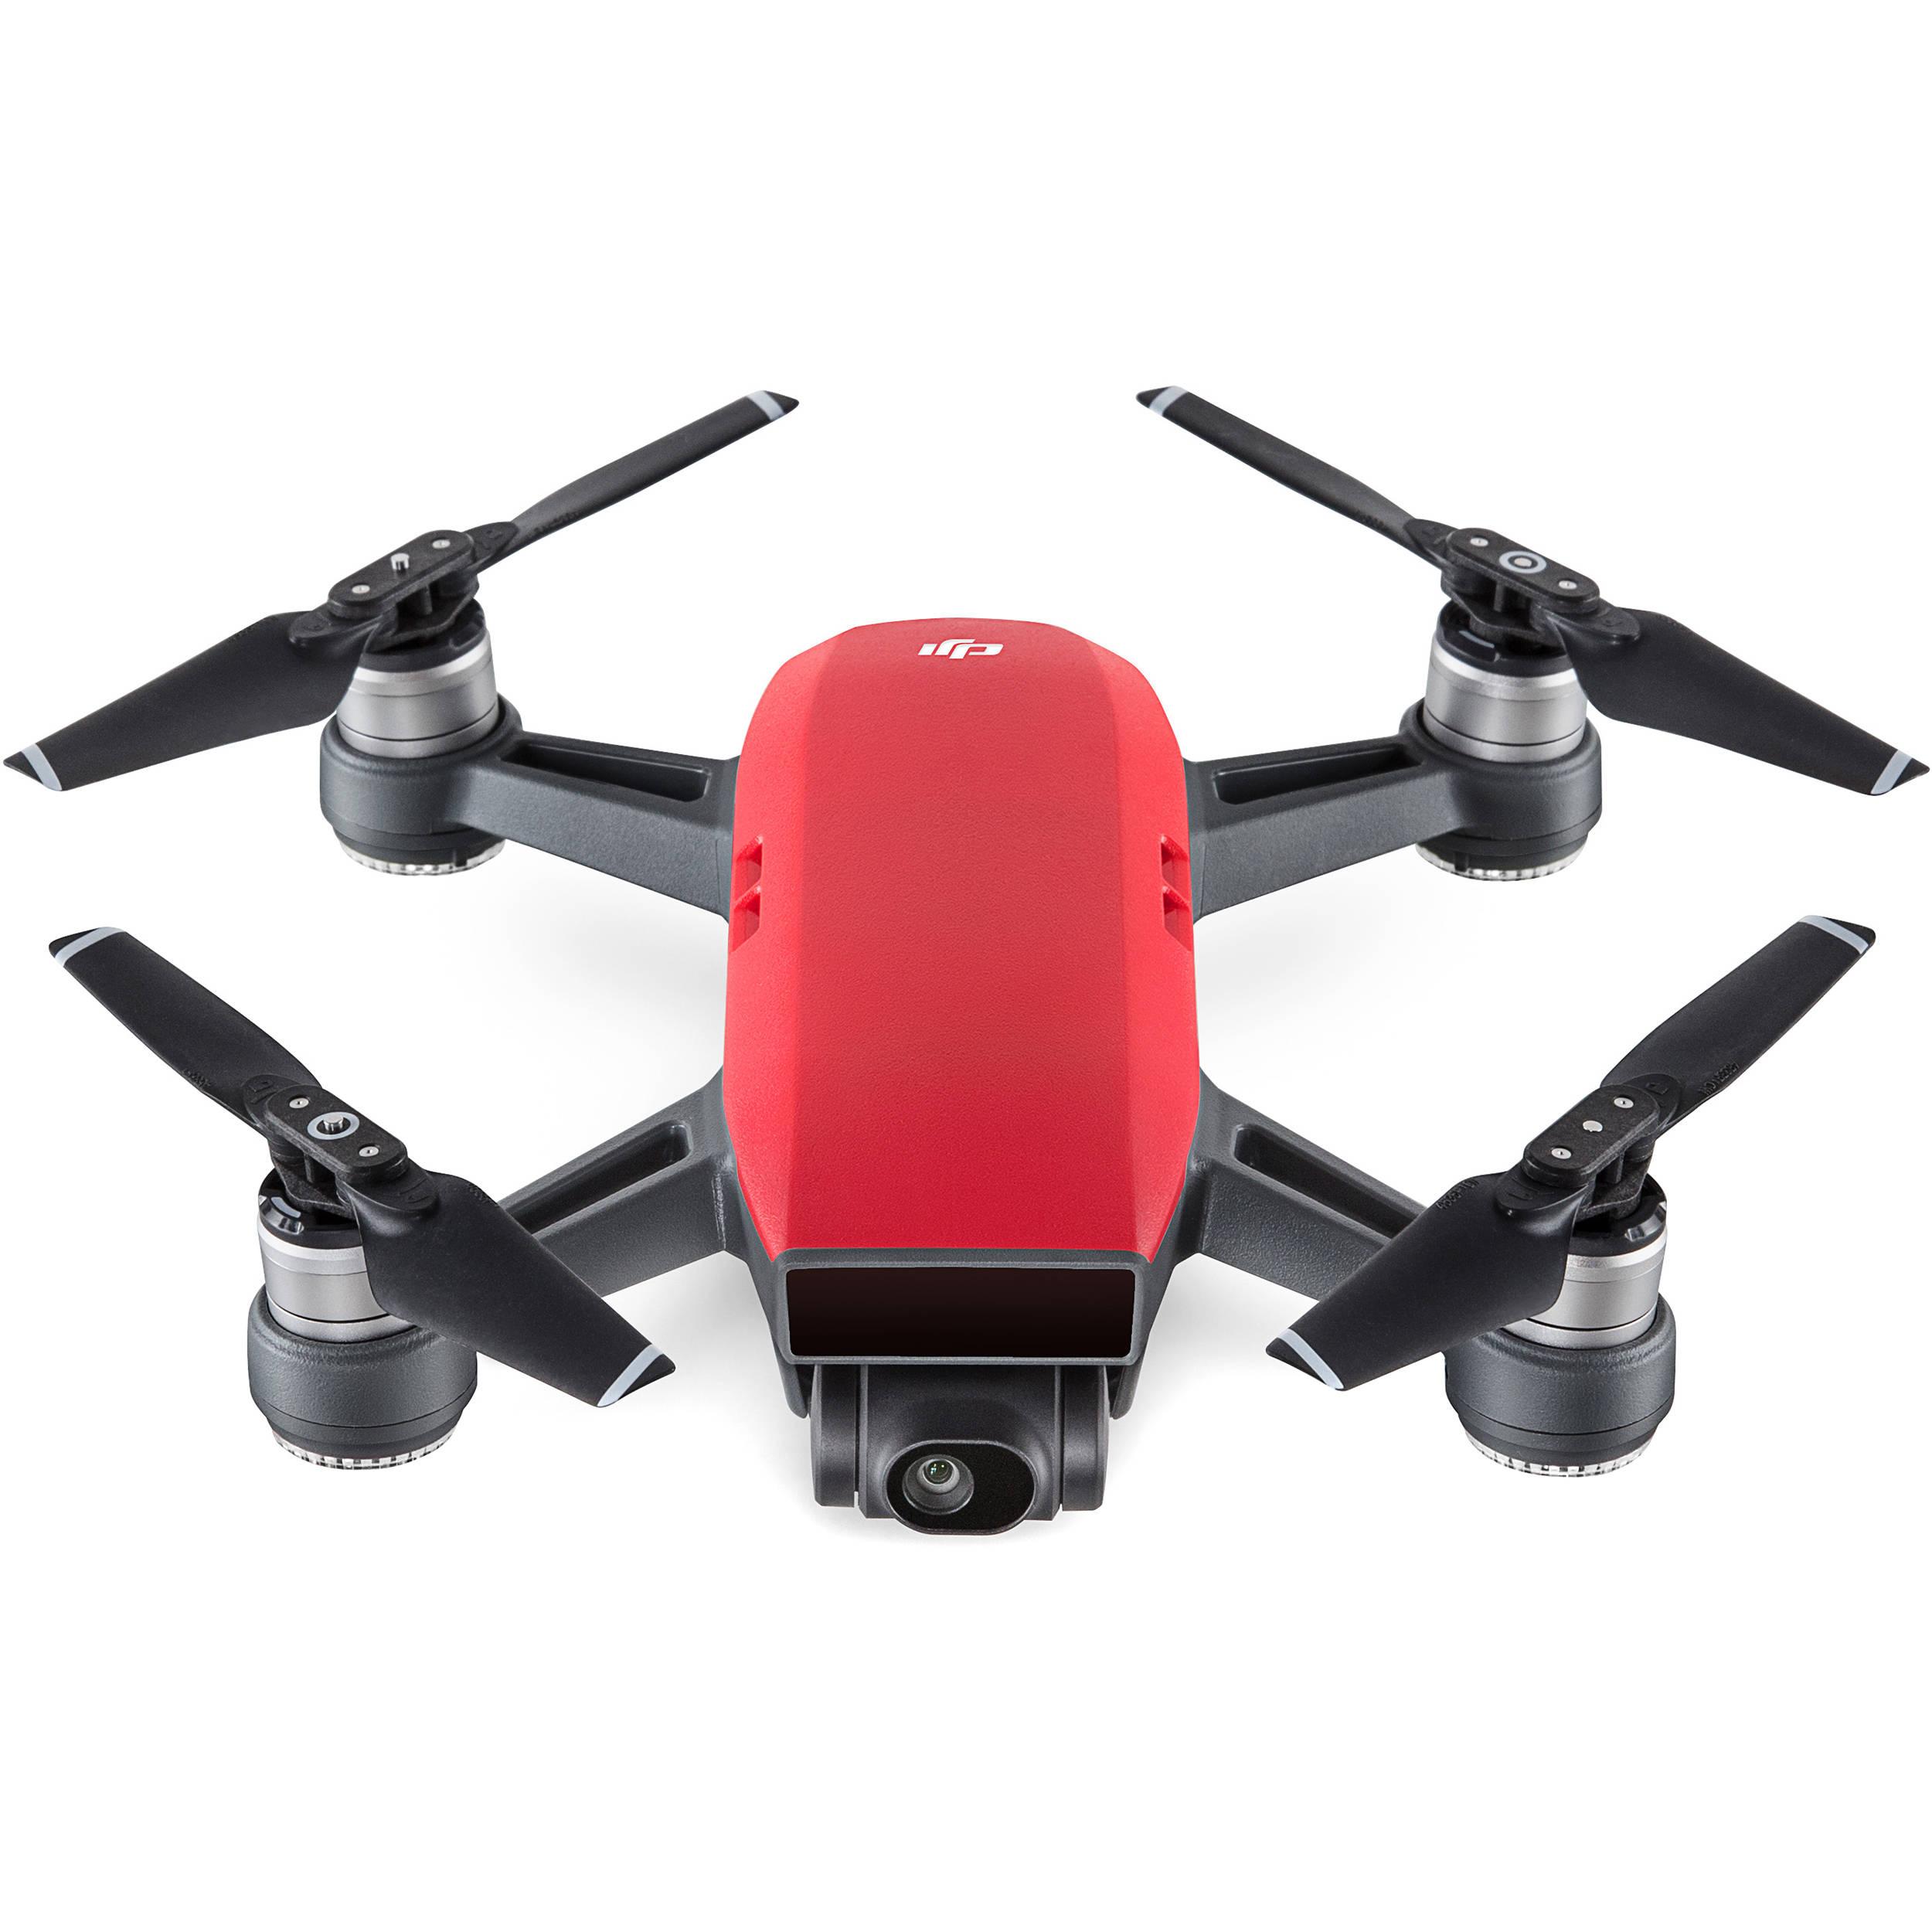 DJI Spark drone £276.17@ AmazonDE - HotUKDeals